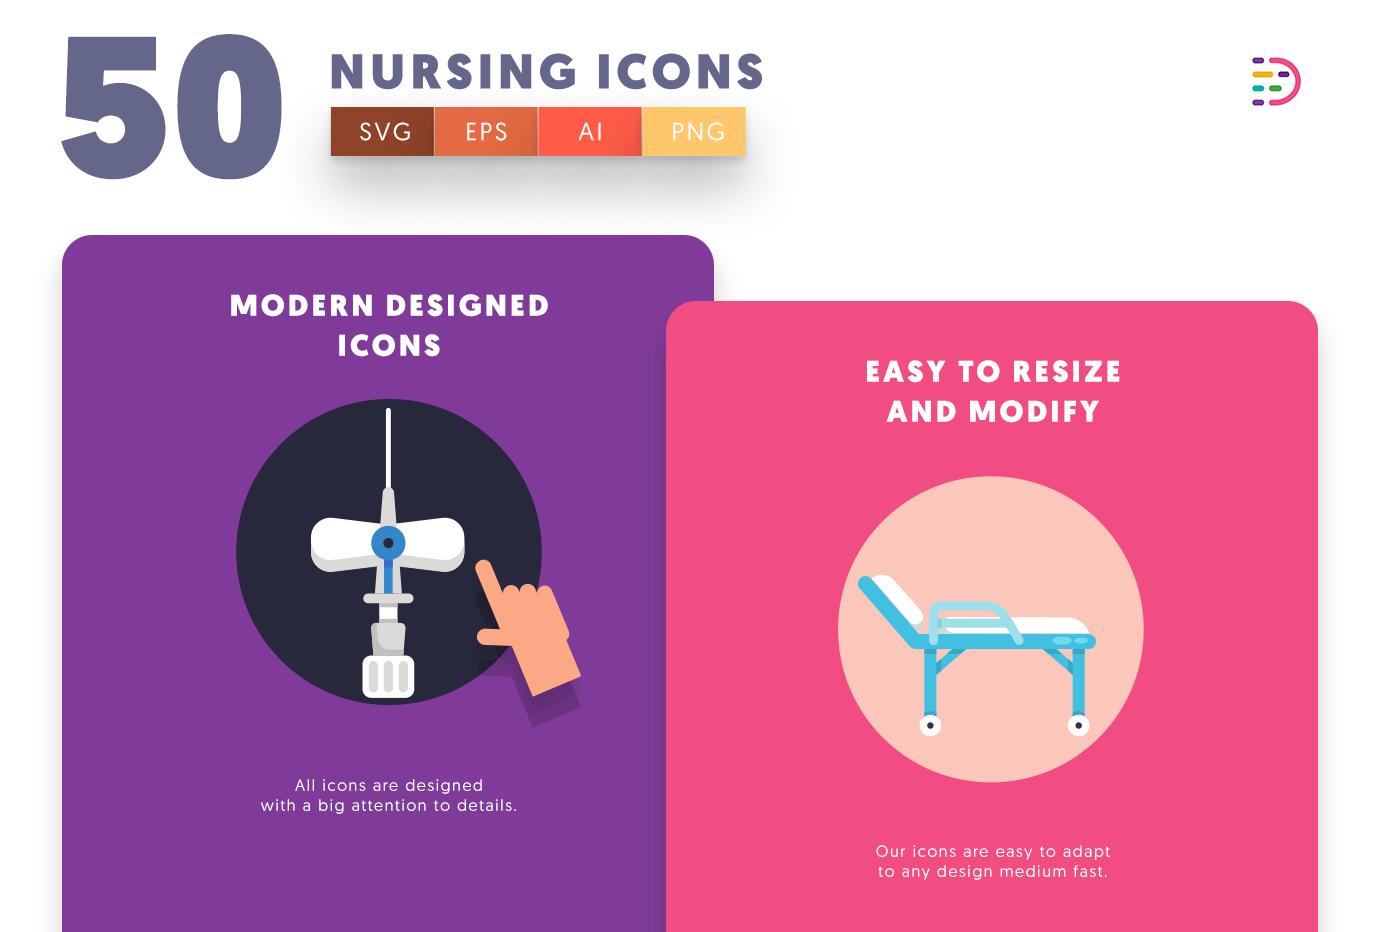 Nursing icons png/svg/eps